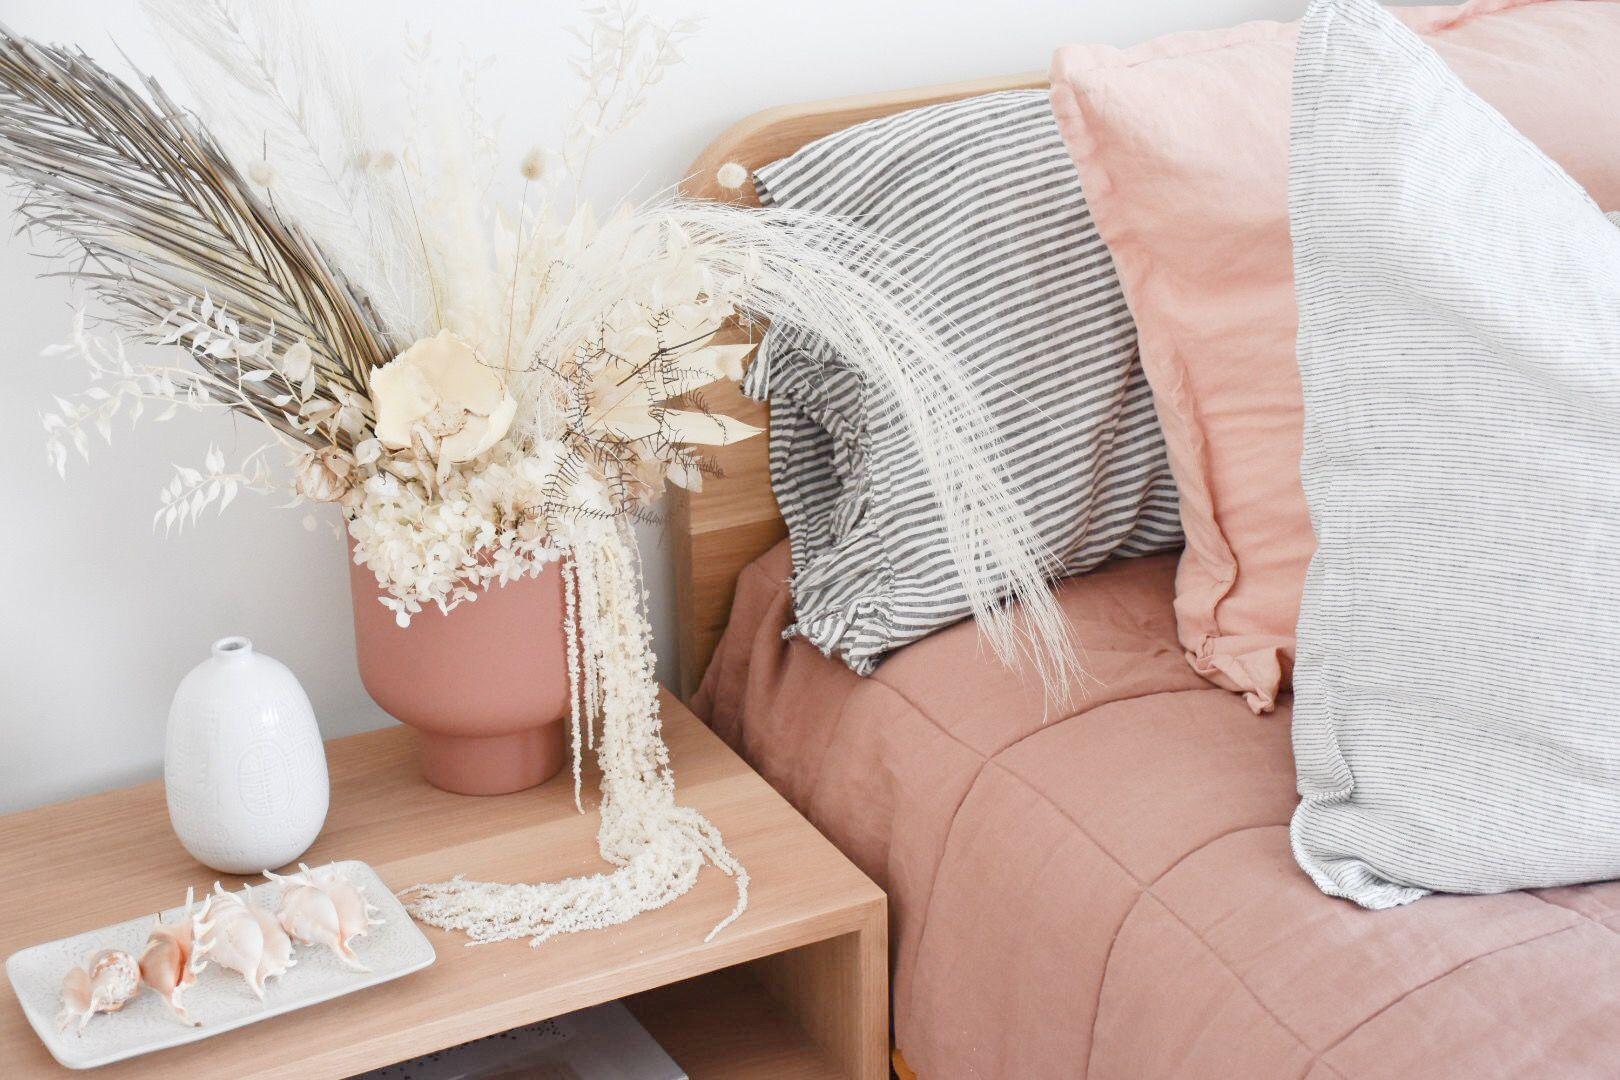 RAW Sunshine Coast Custom Furniture, Joinery & Homewares